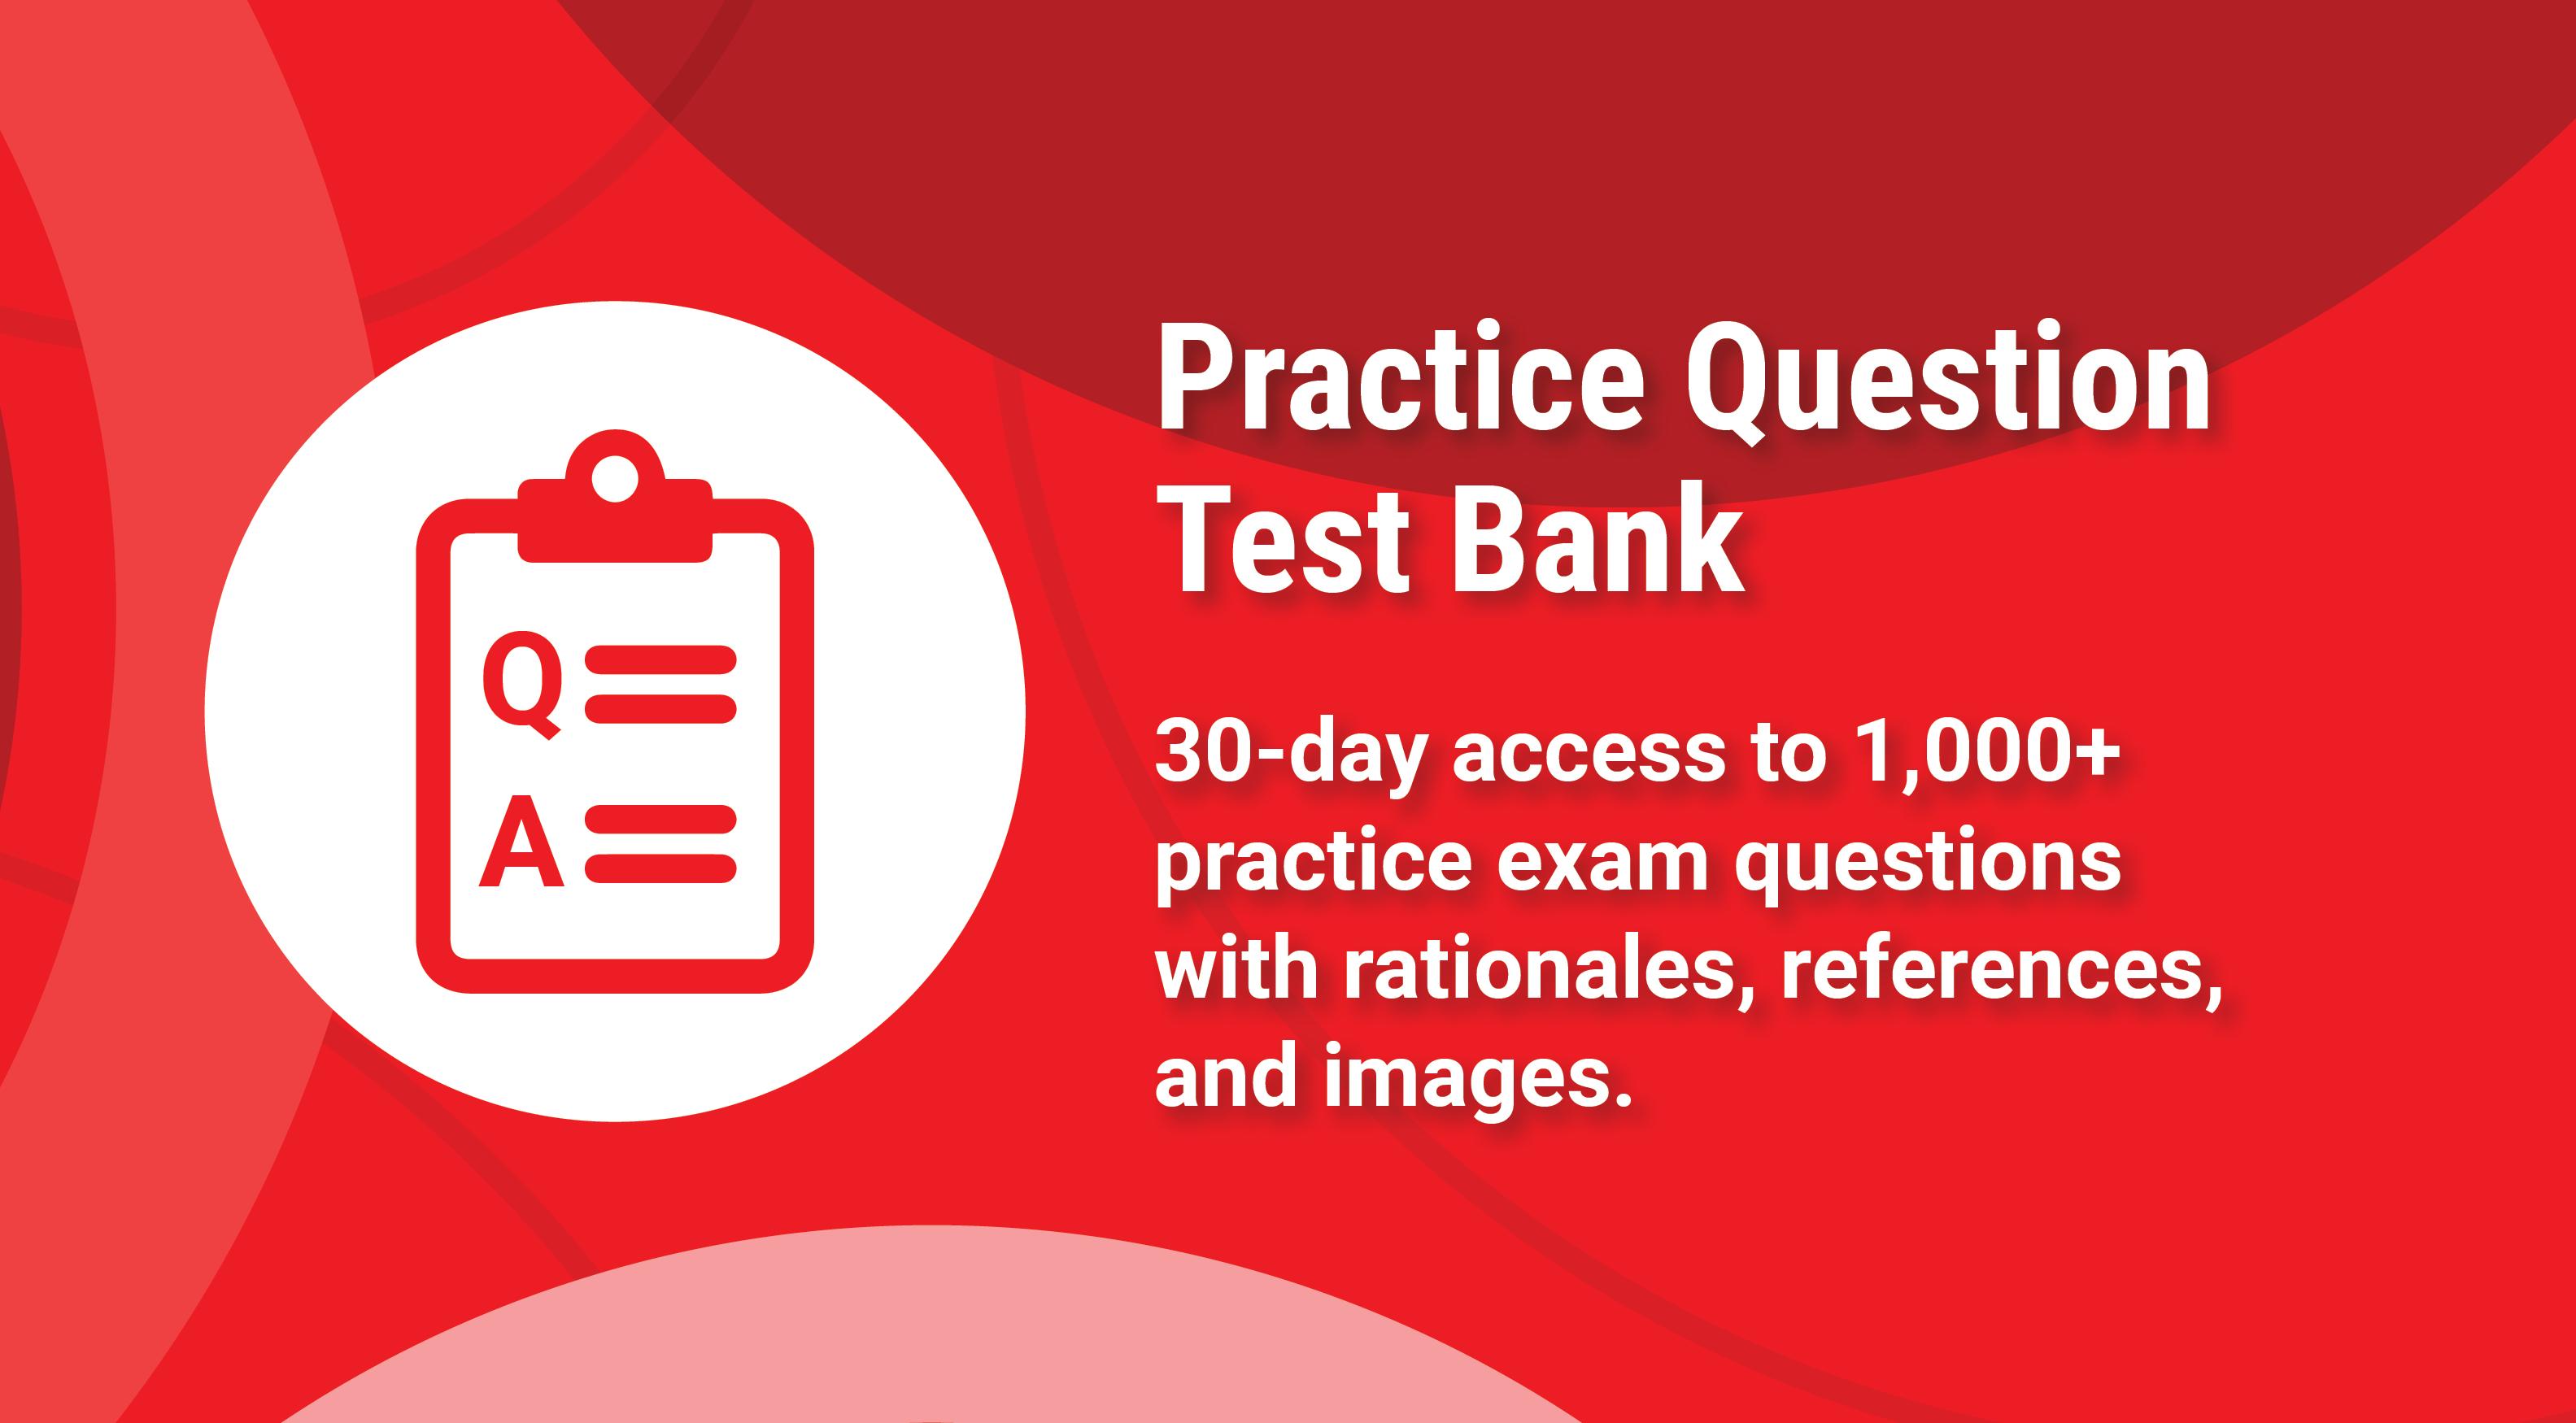 Practice Question Test Bank